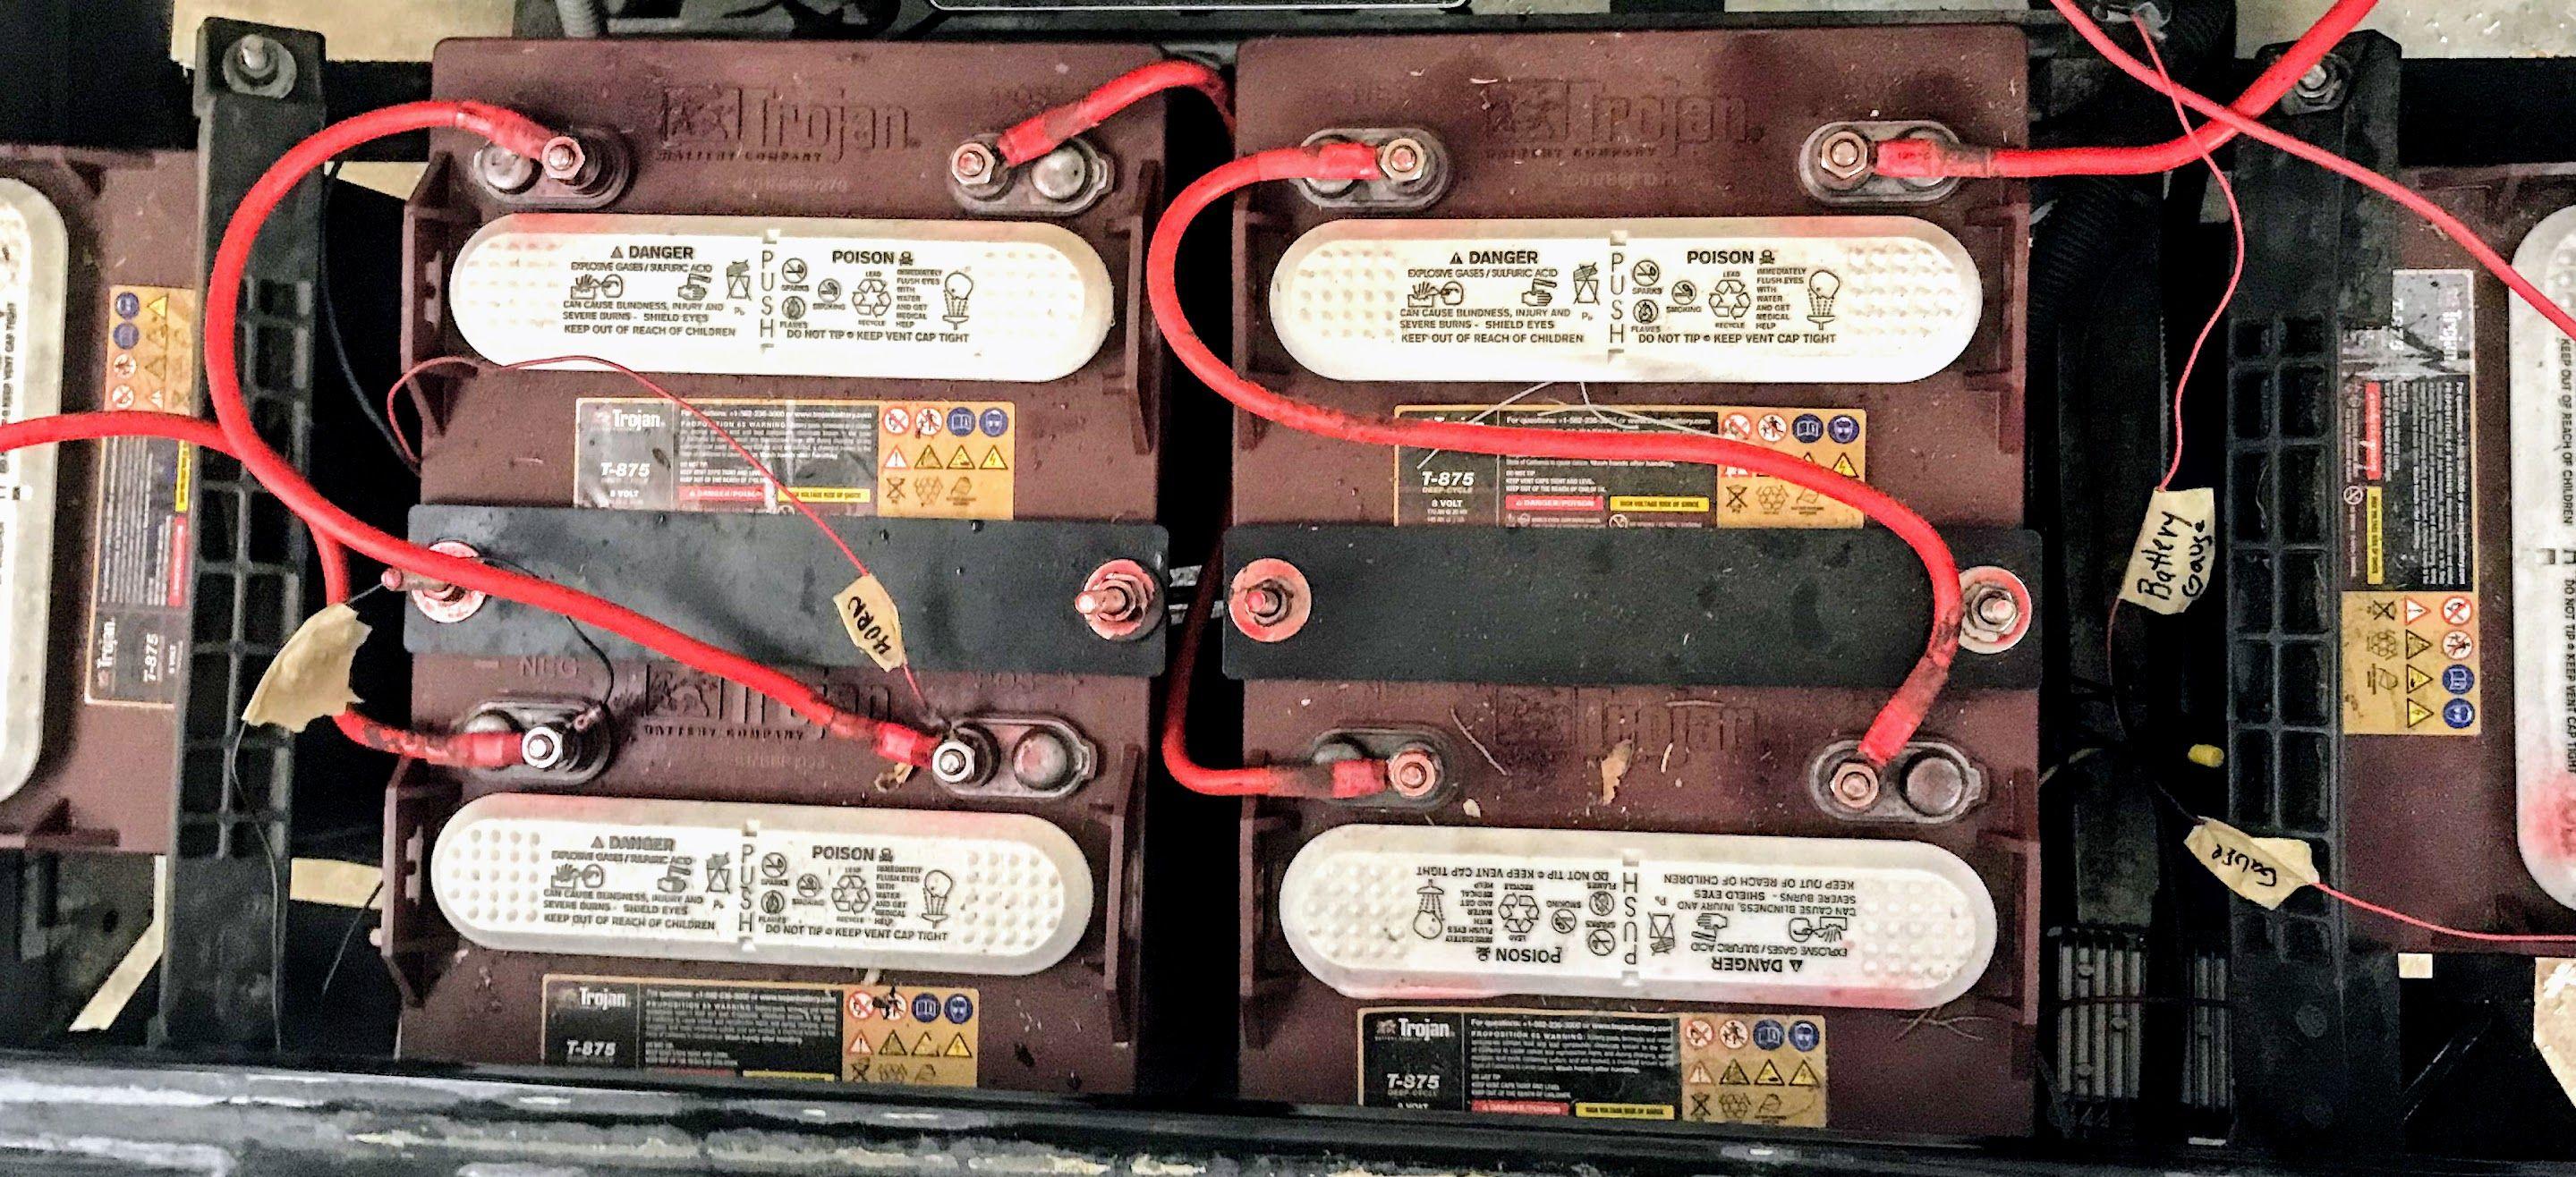 32+ Charging 8 volt batteries in golf cart information